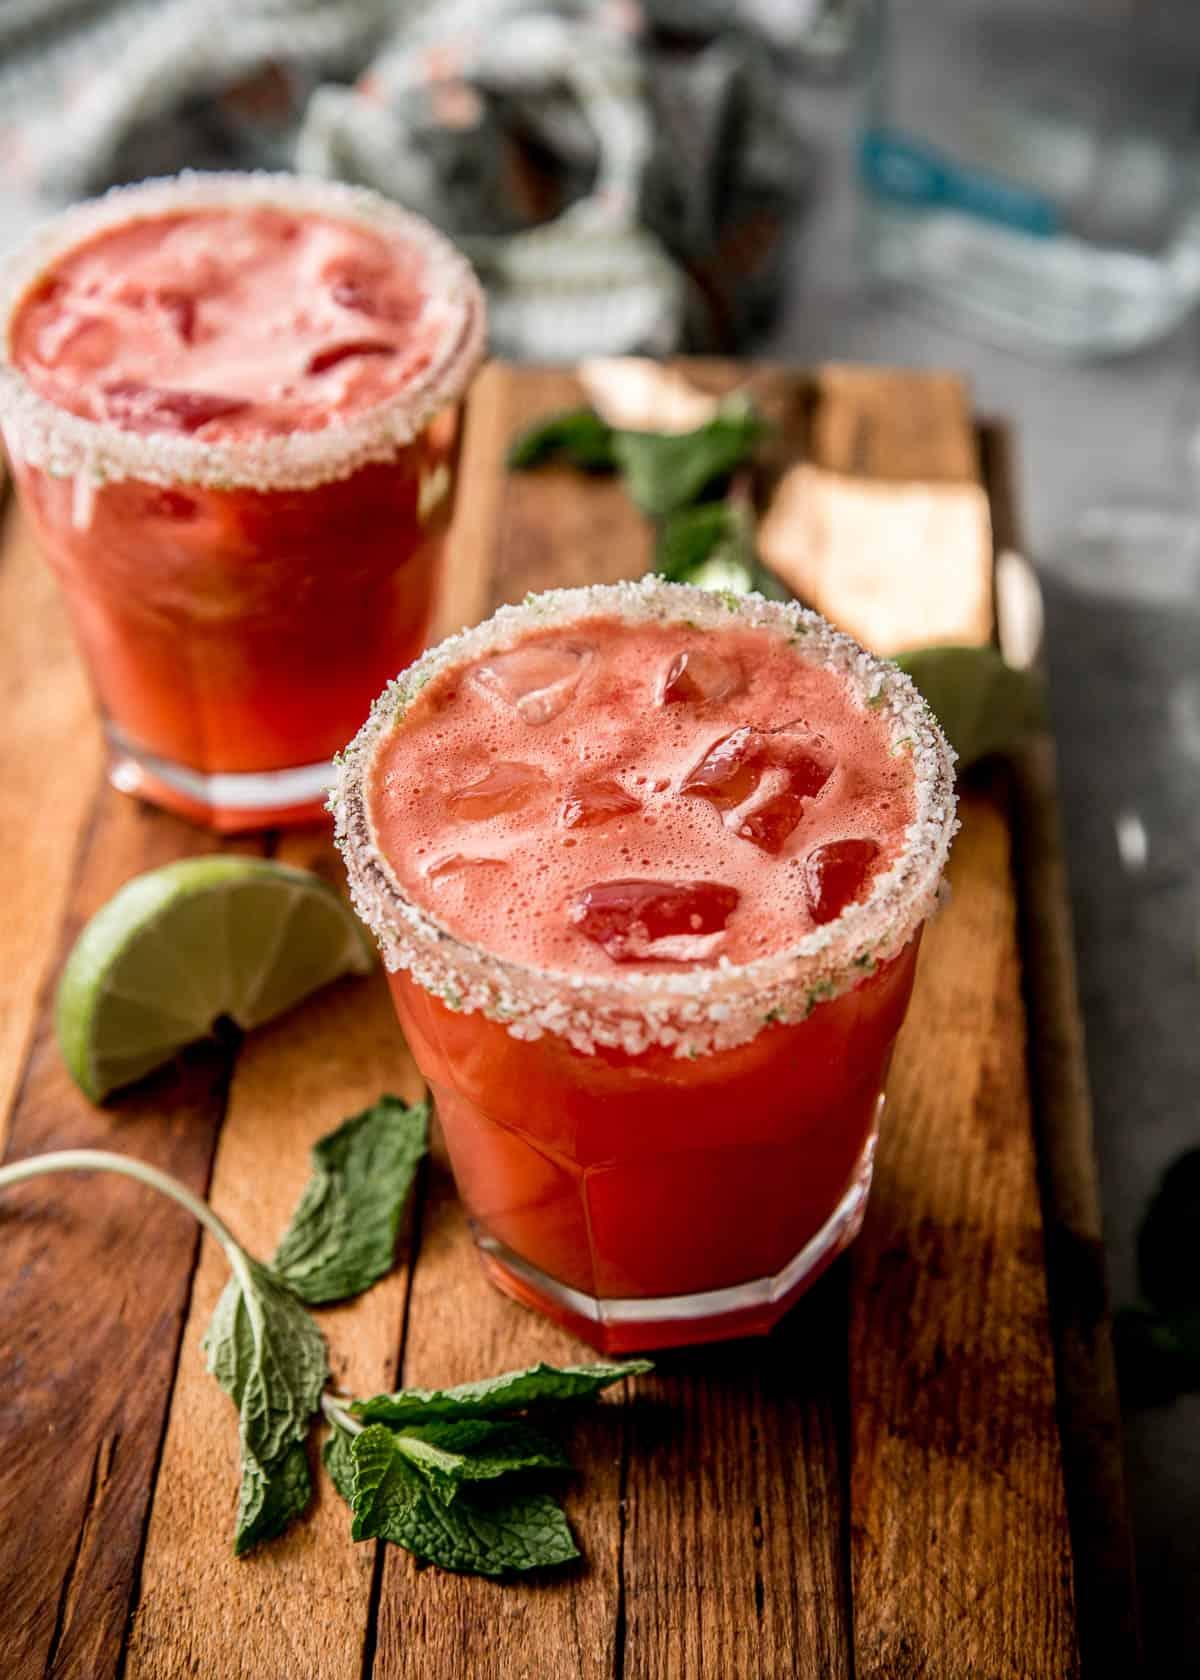 watermelon margarita in a clear glass